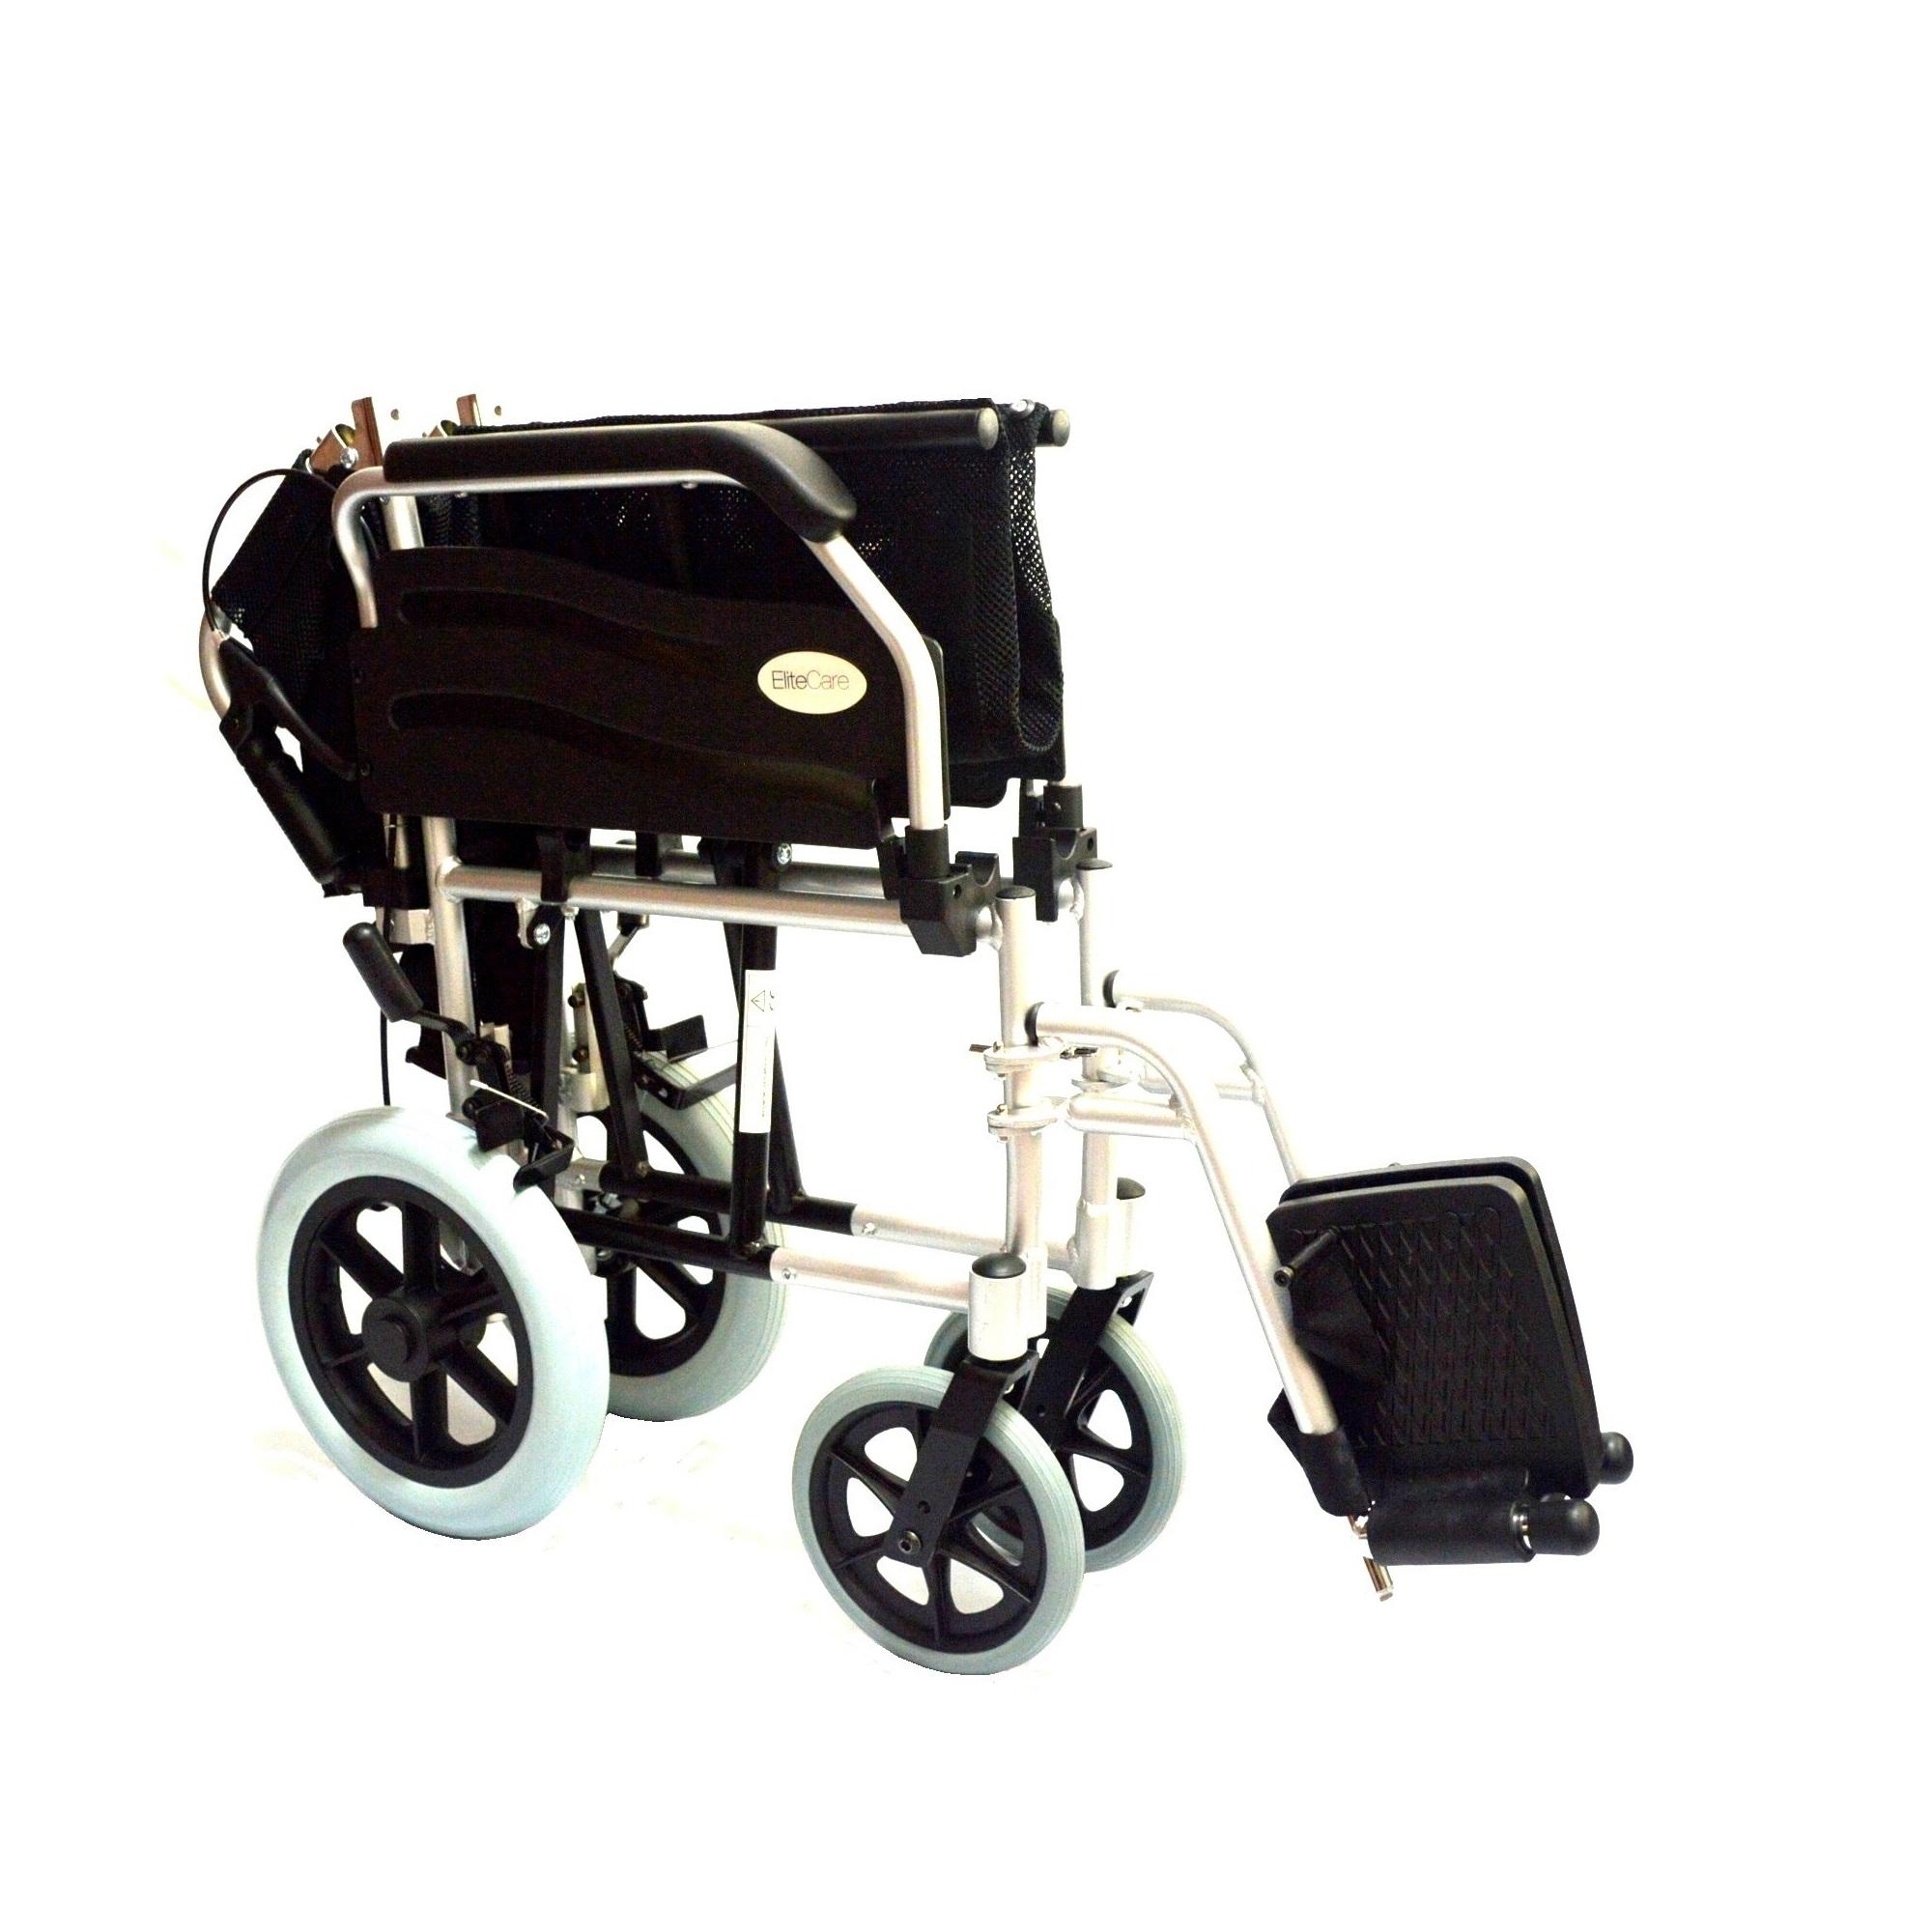 Lightweight Aluminium folding transit wheelchair with 20